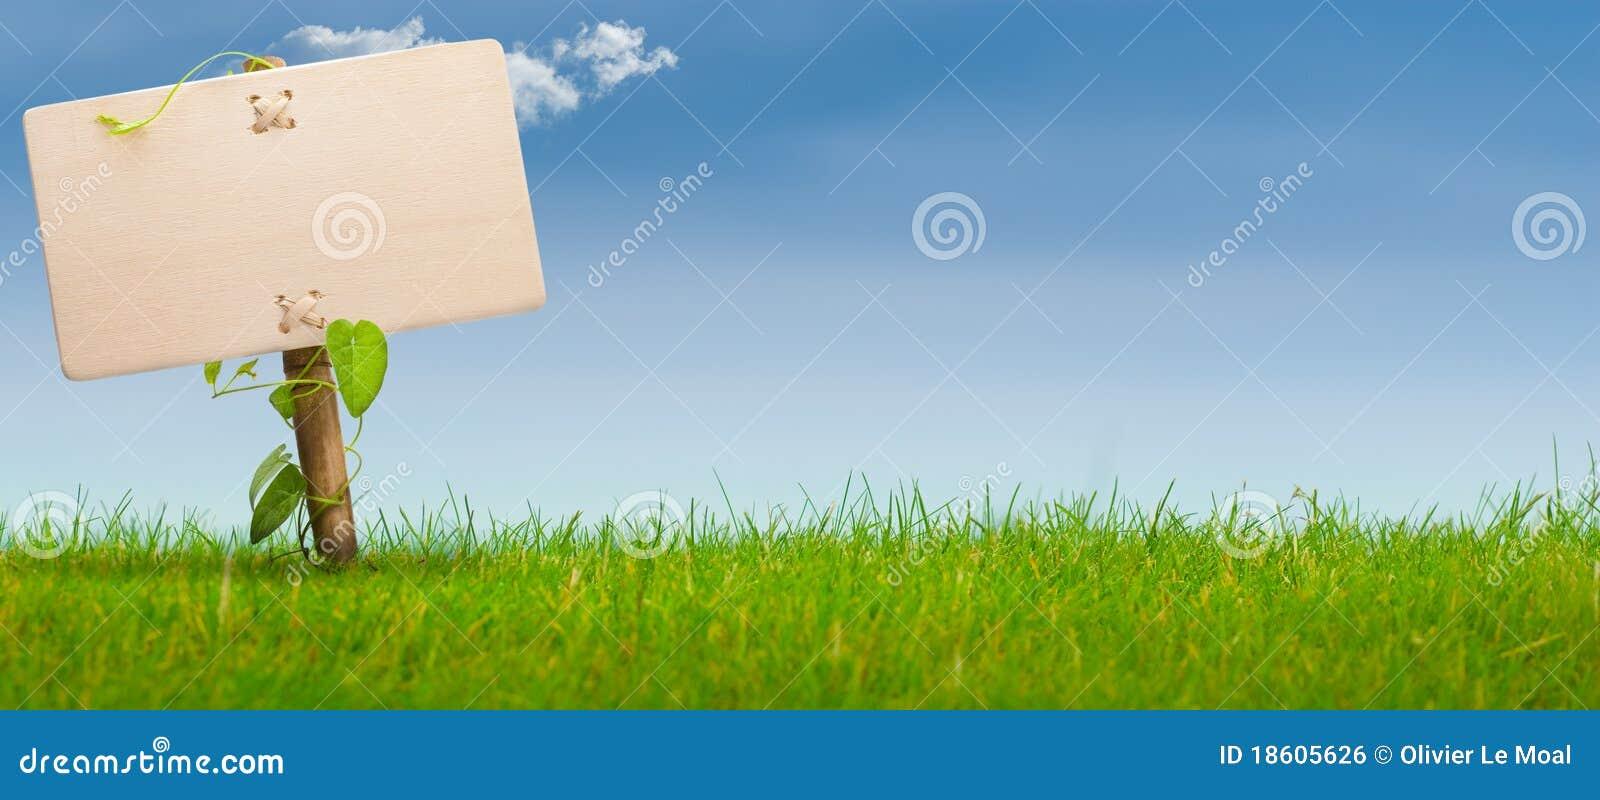 Green sign, horizontal banner, blue sky